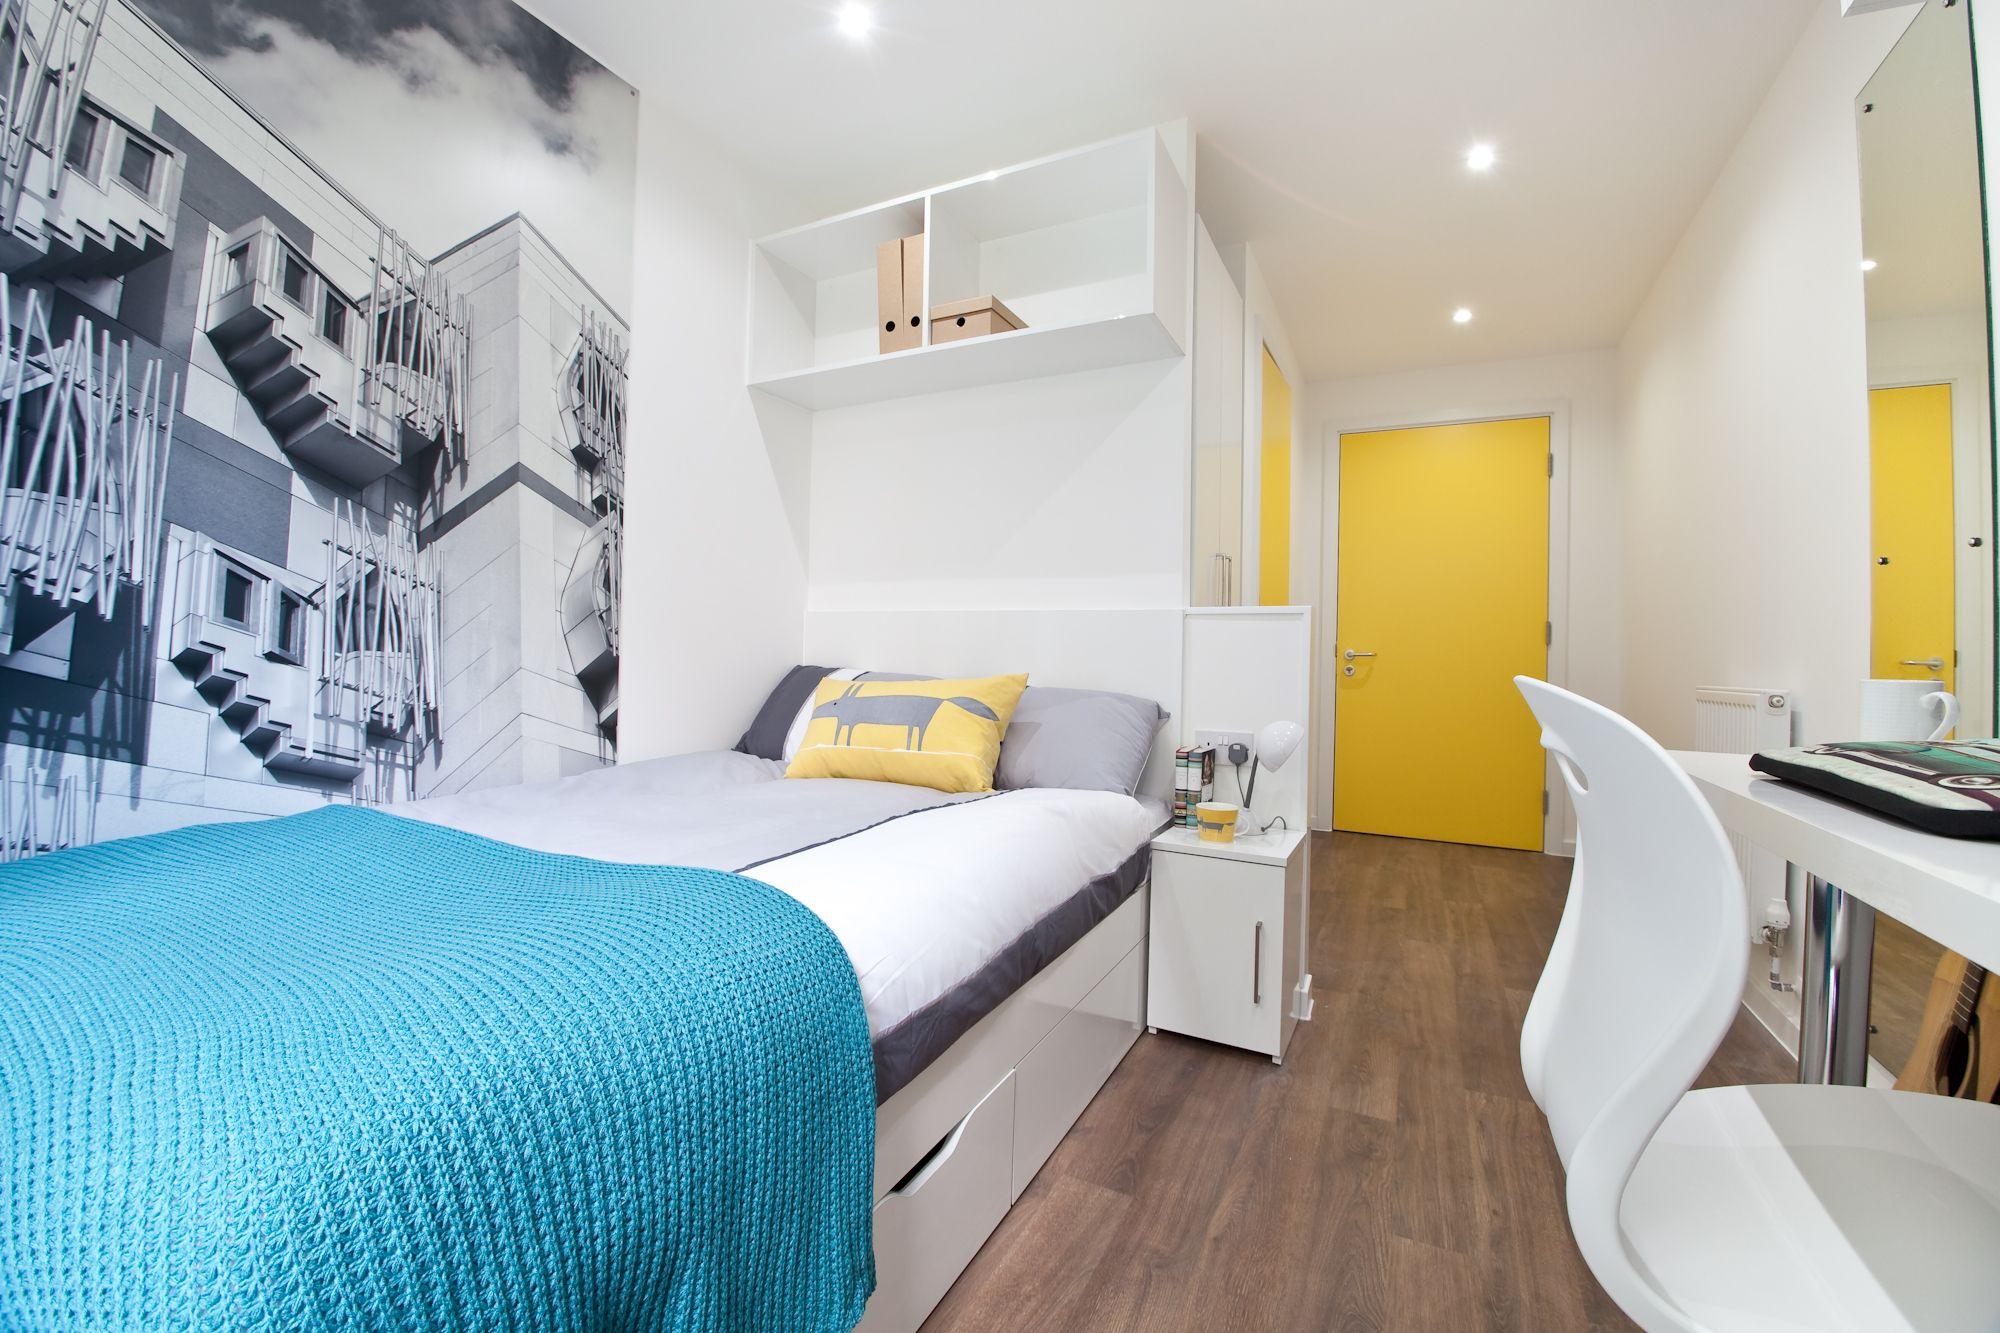 2 Bed Apartment En Suite Bedroom At Edge Apartments